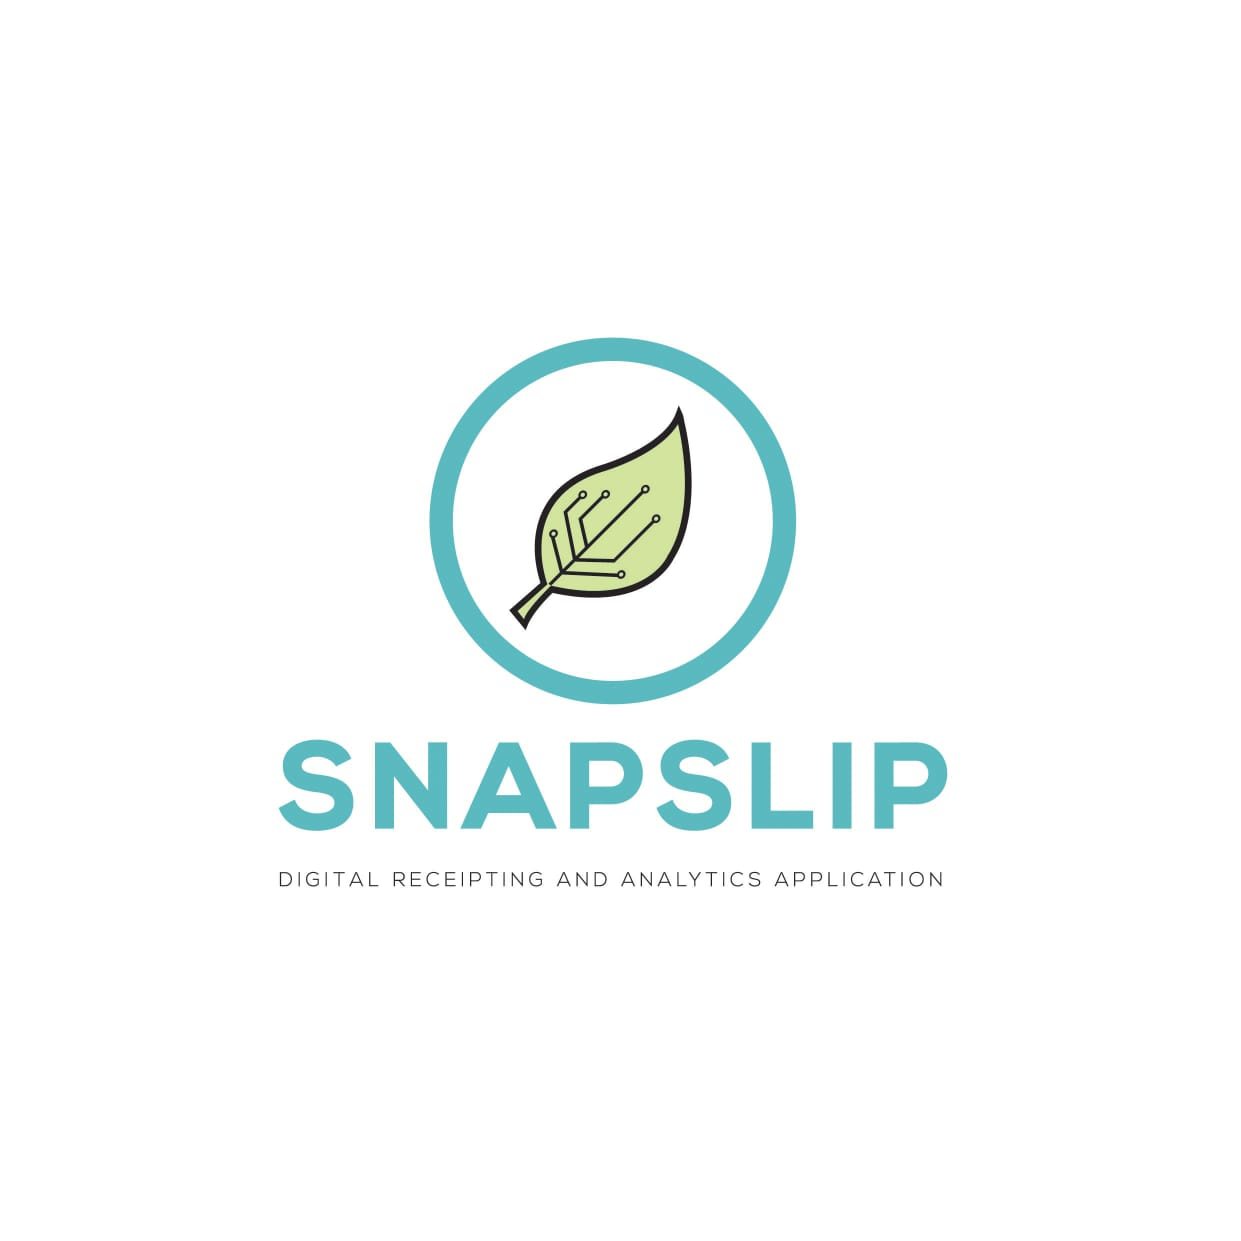 Snapslip logo